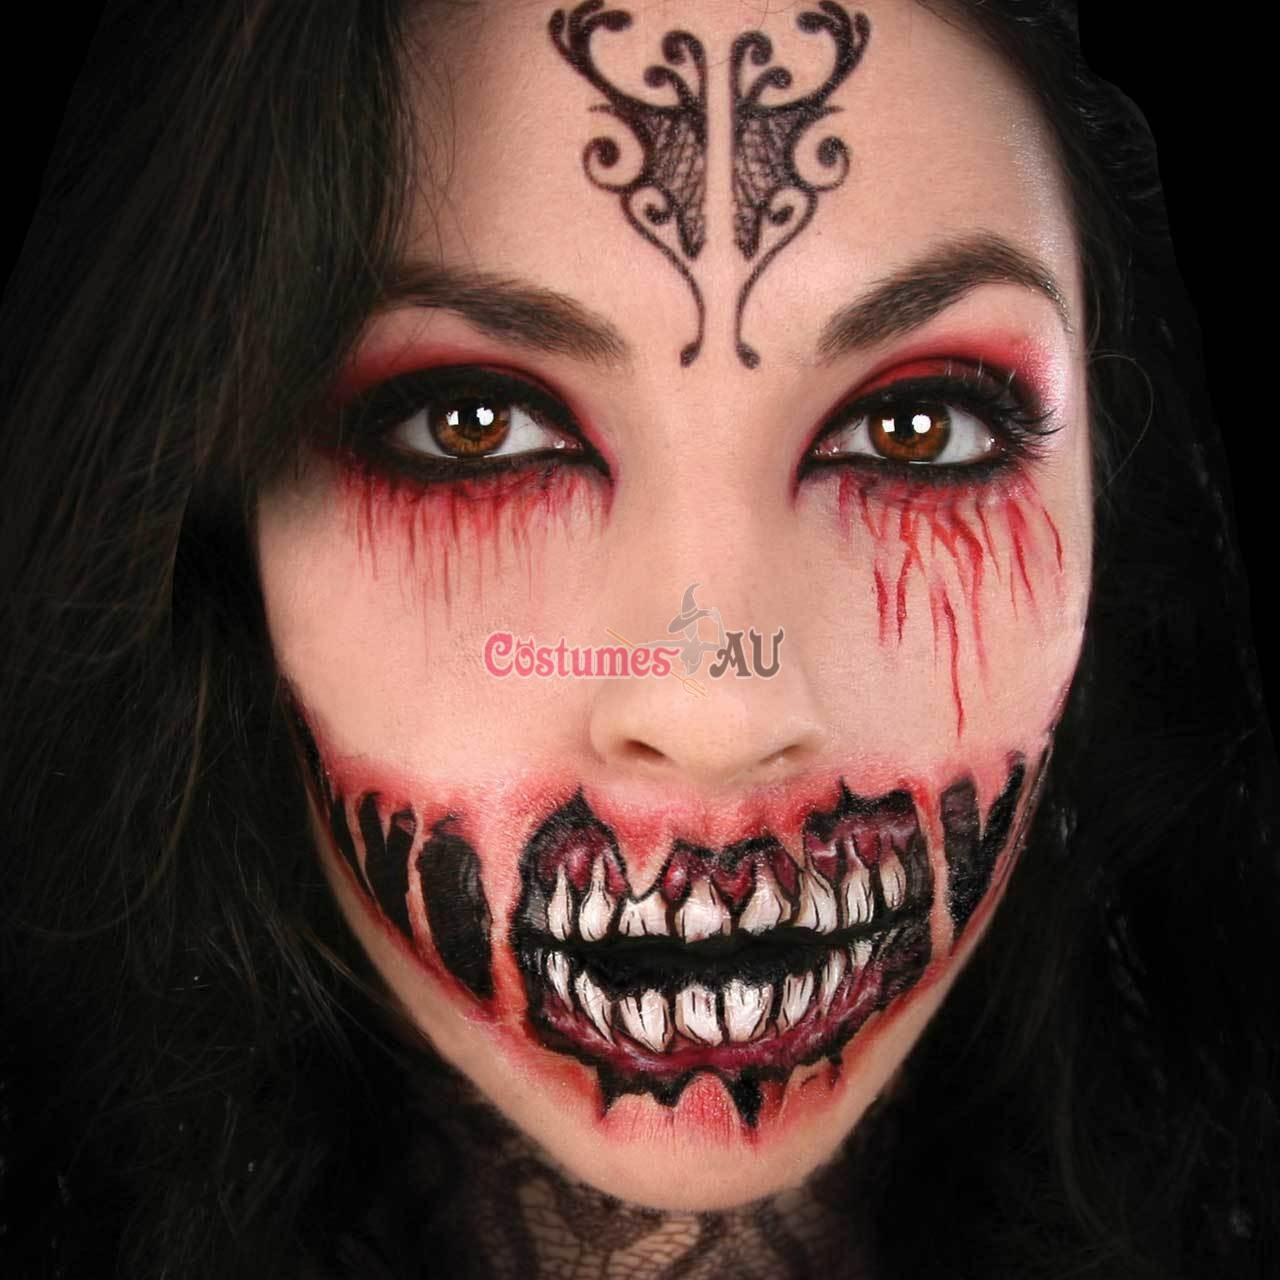 Halloween Temporary Tattoos For Kids